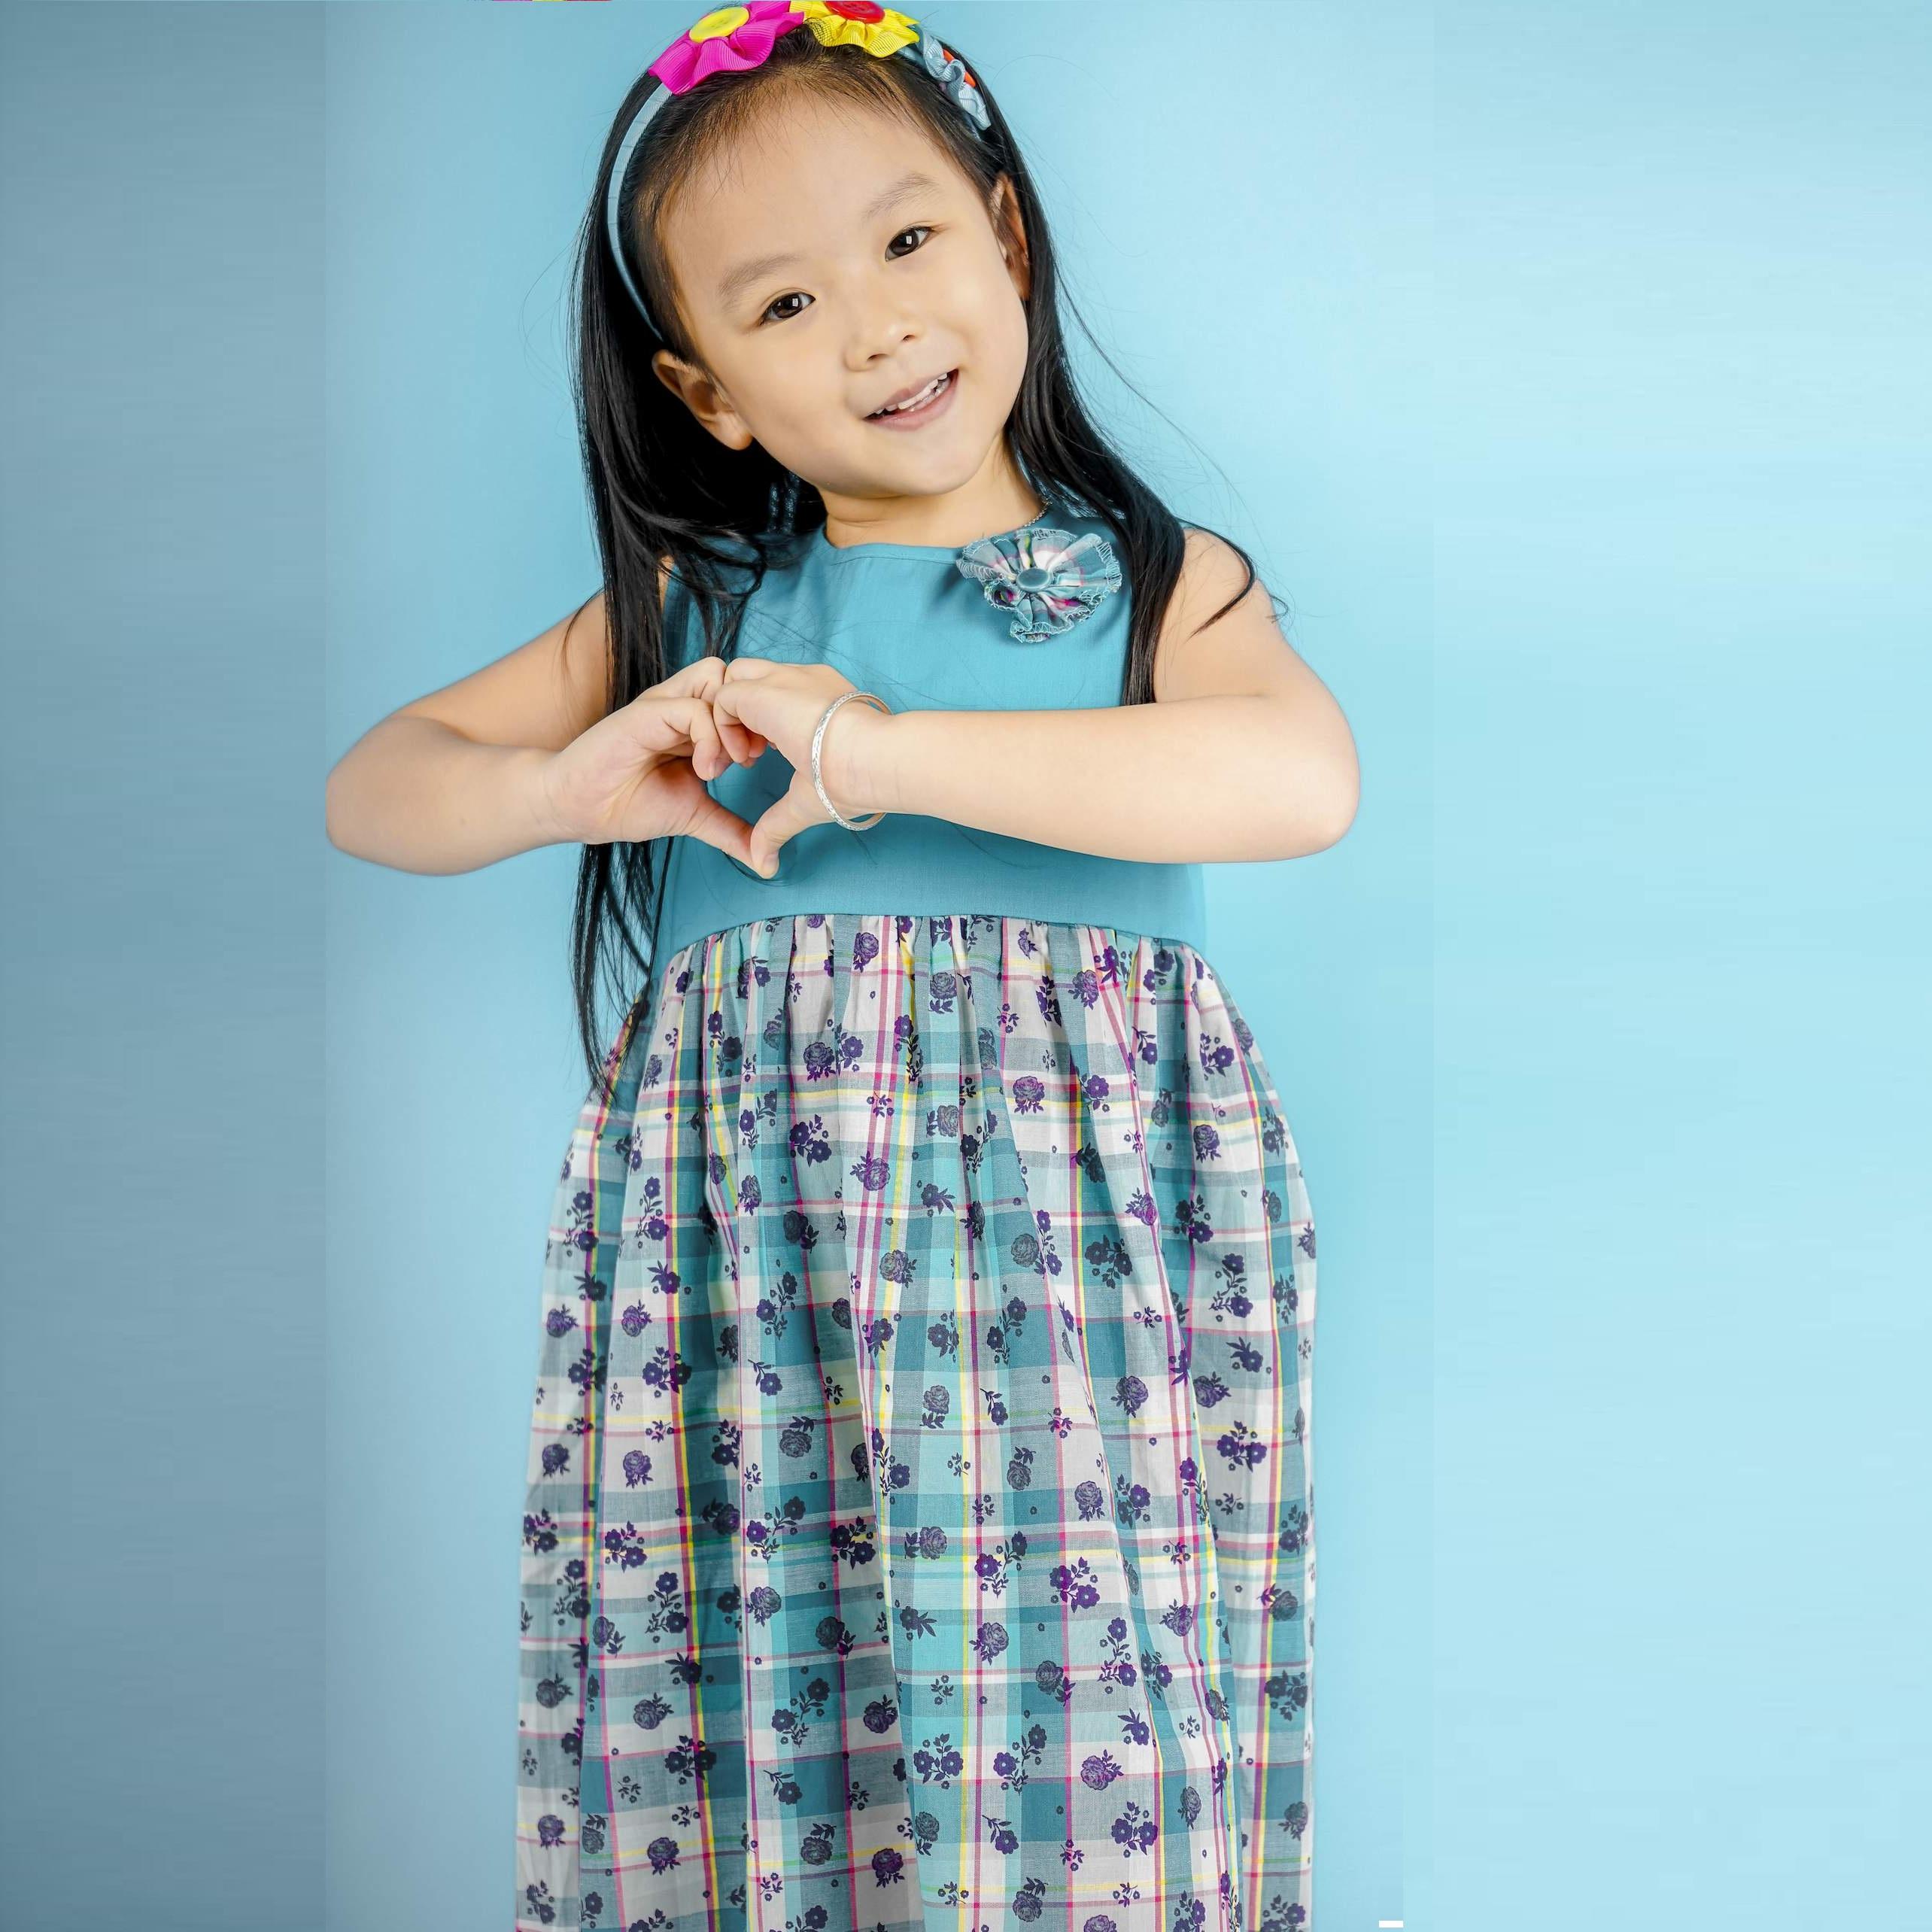 Đầm hoa bé gái phối nơ – UKID88